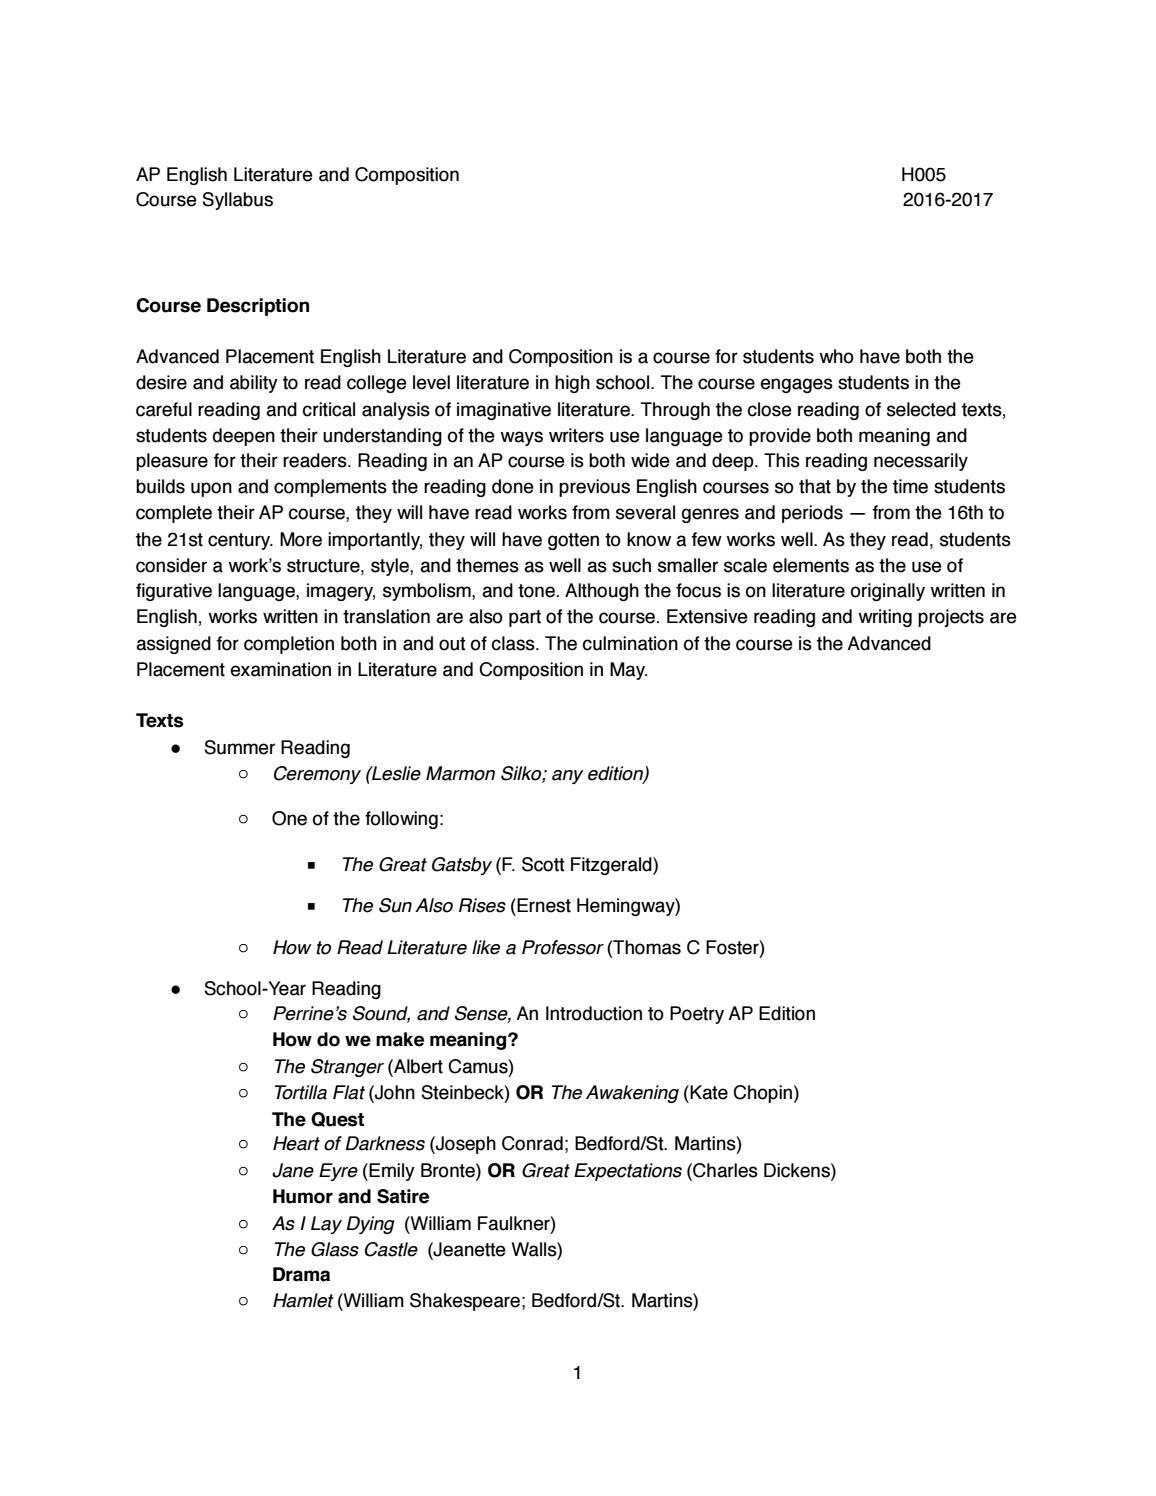 Critical analysis essay ghostwriting service